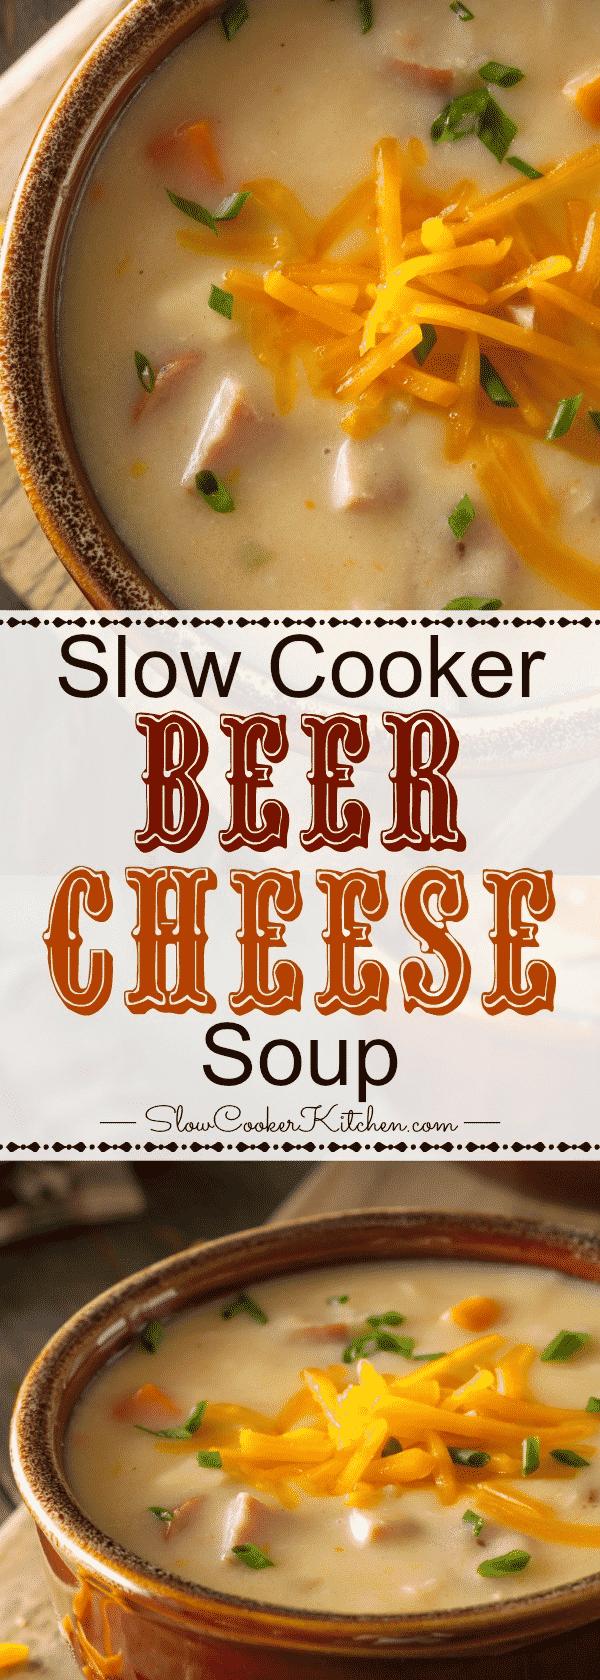 Slow Cooker Beer Cheese Soup #slowcookercrockpots